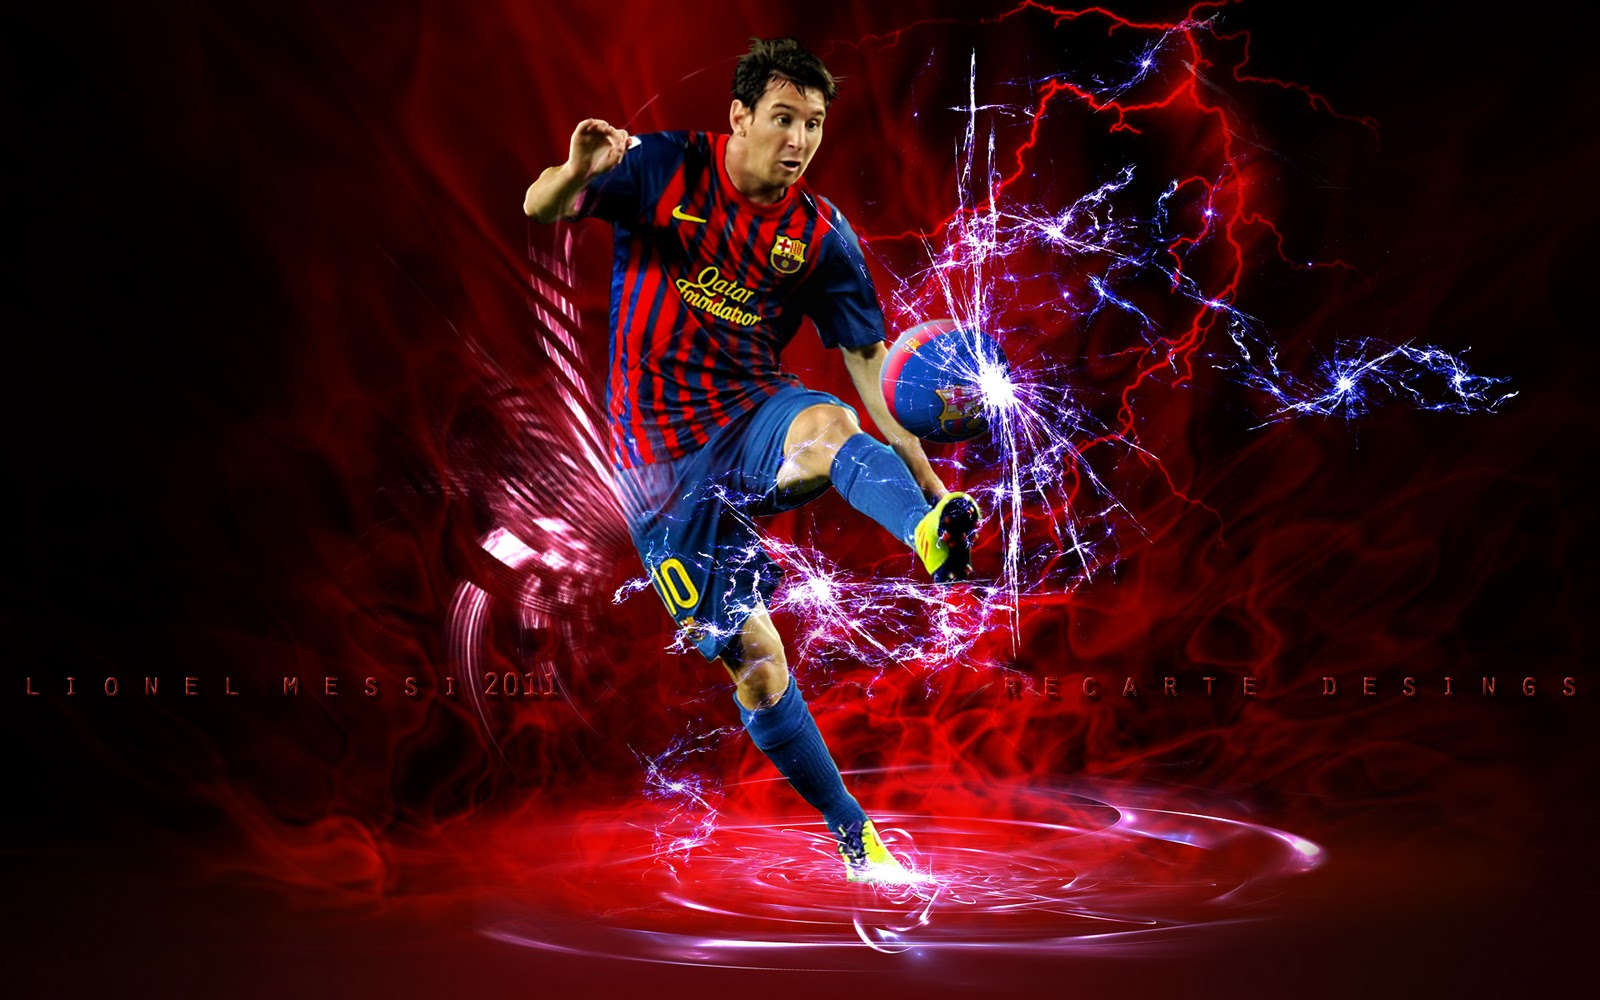 Balón De Fútbol 1920x1080 Hd: Lionel Messi Wallpapers 2012 HD